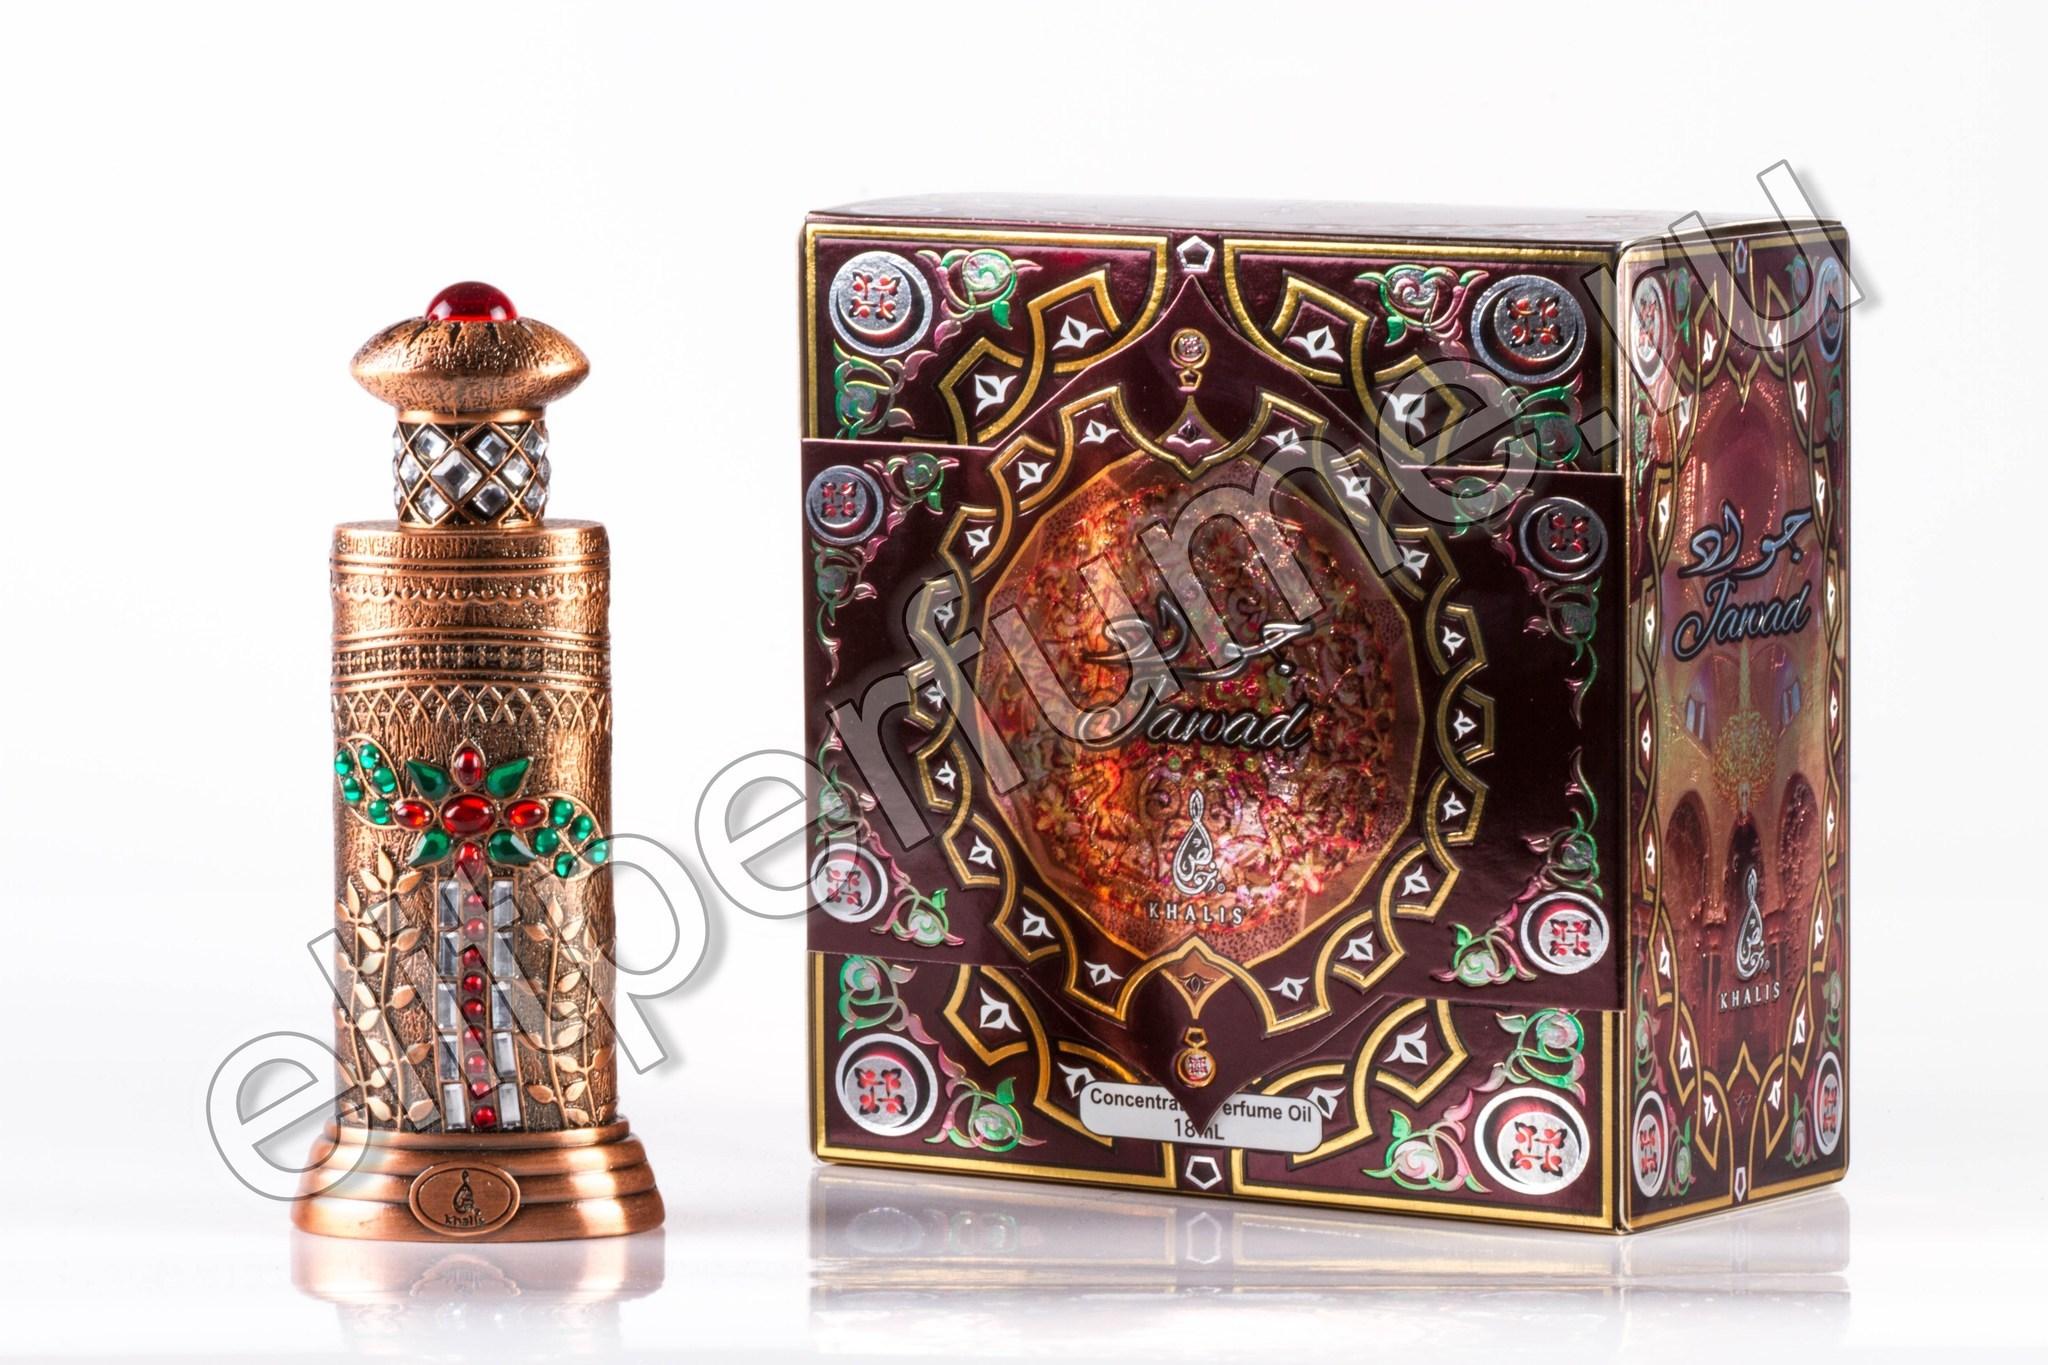 Пробник для Jawad Джавад 1 мл арабские масляные духи от Халис Khalis Perfumes